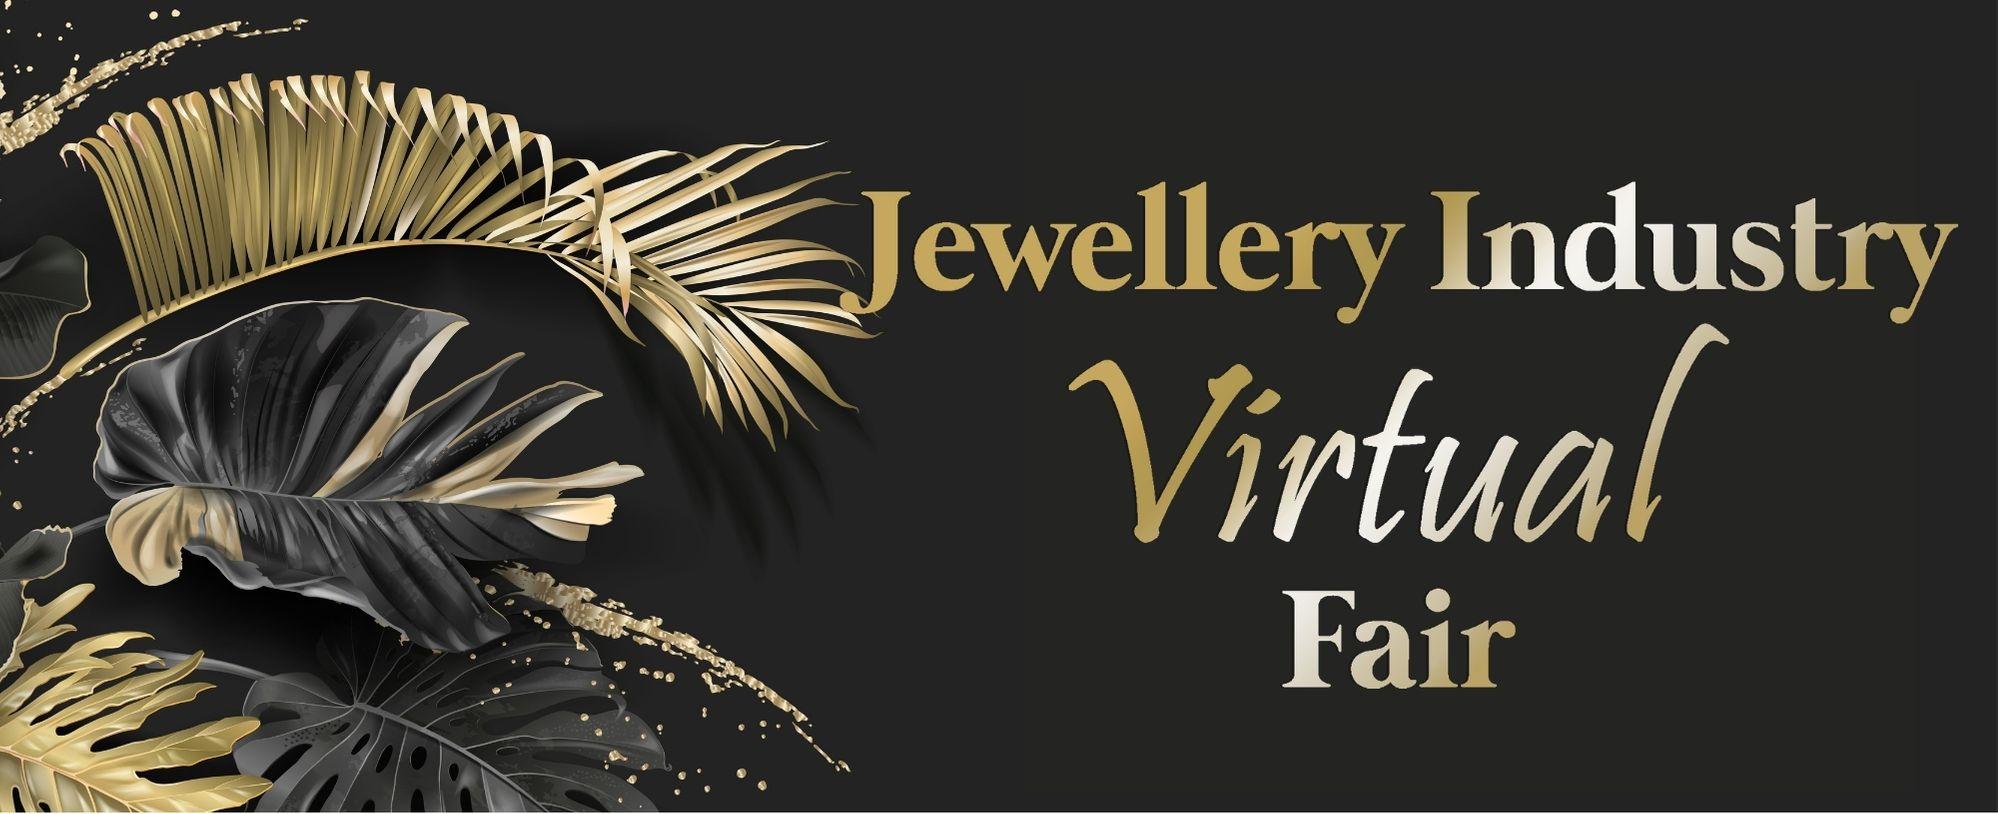 Jewellery Industry Virtual Fair